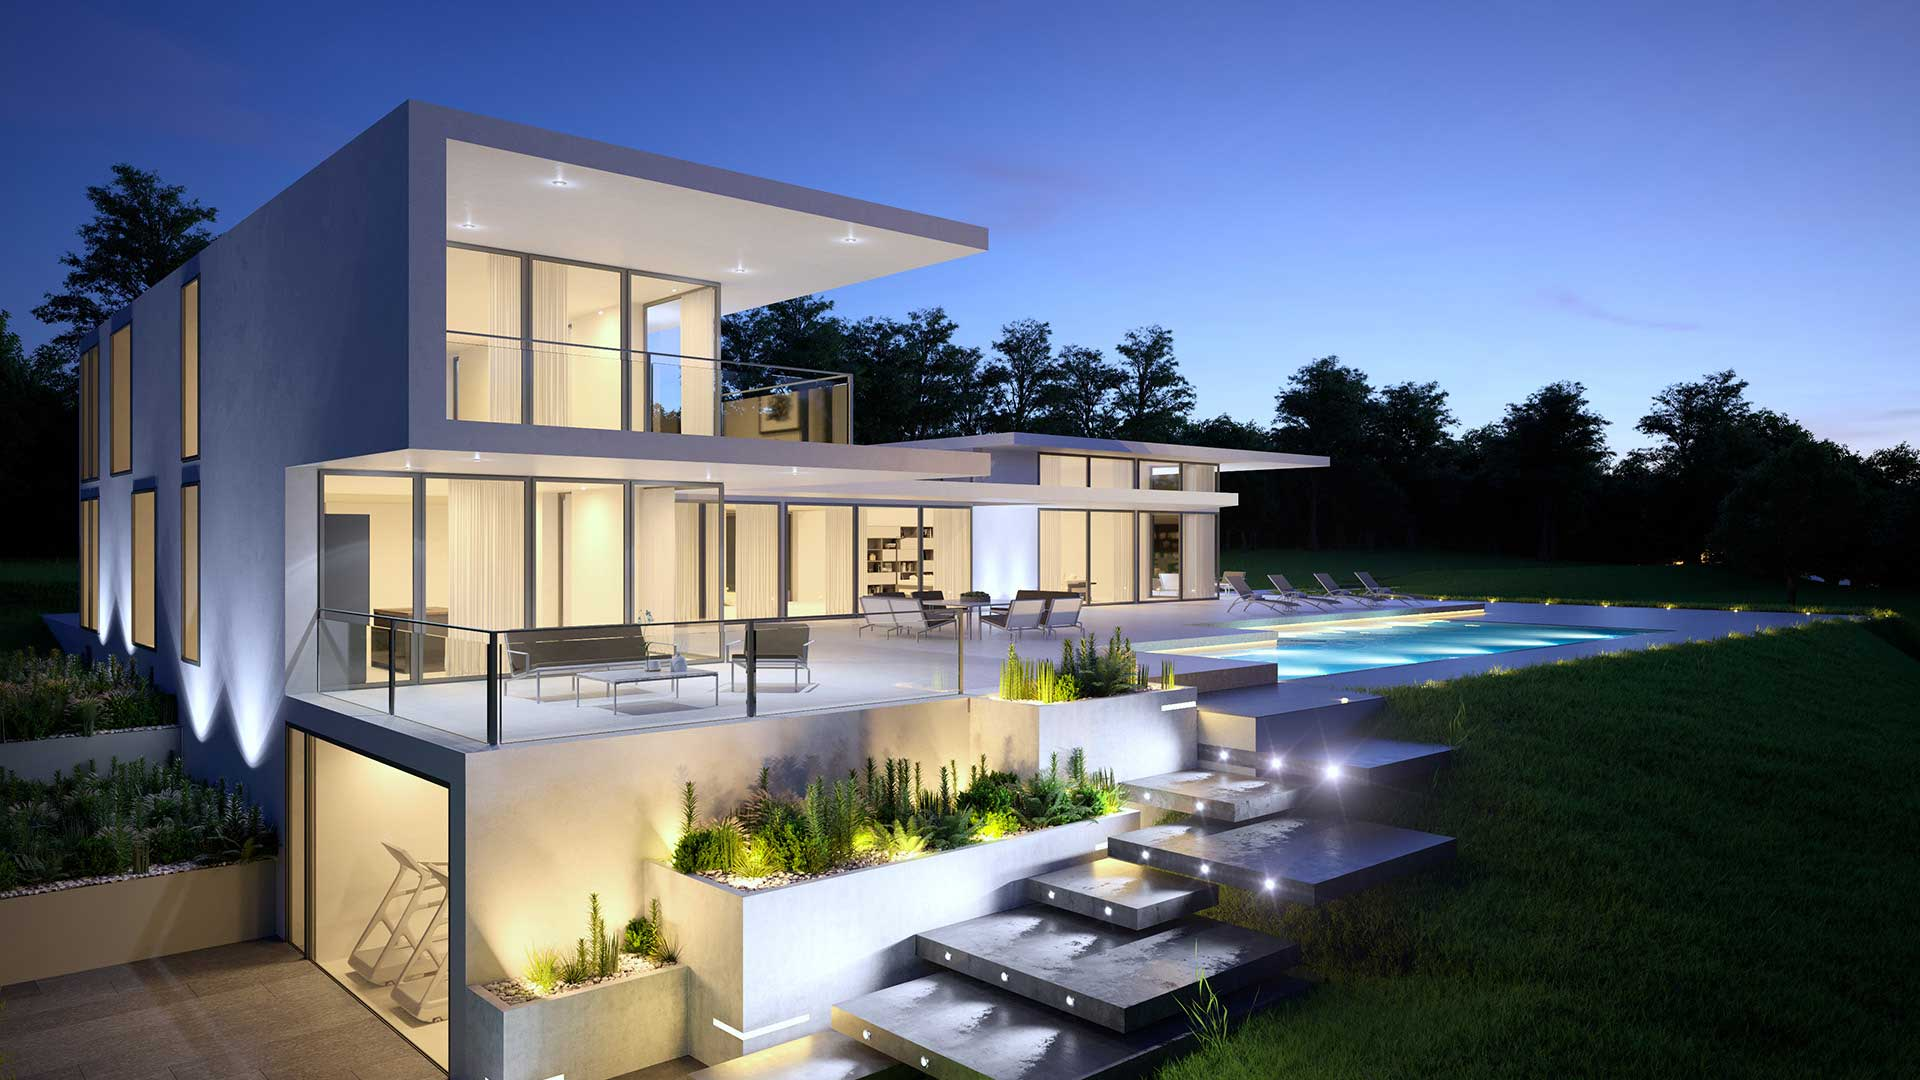 Agence graphisme 3d perspective 3d villa suisse for Agence architecture suisse